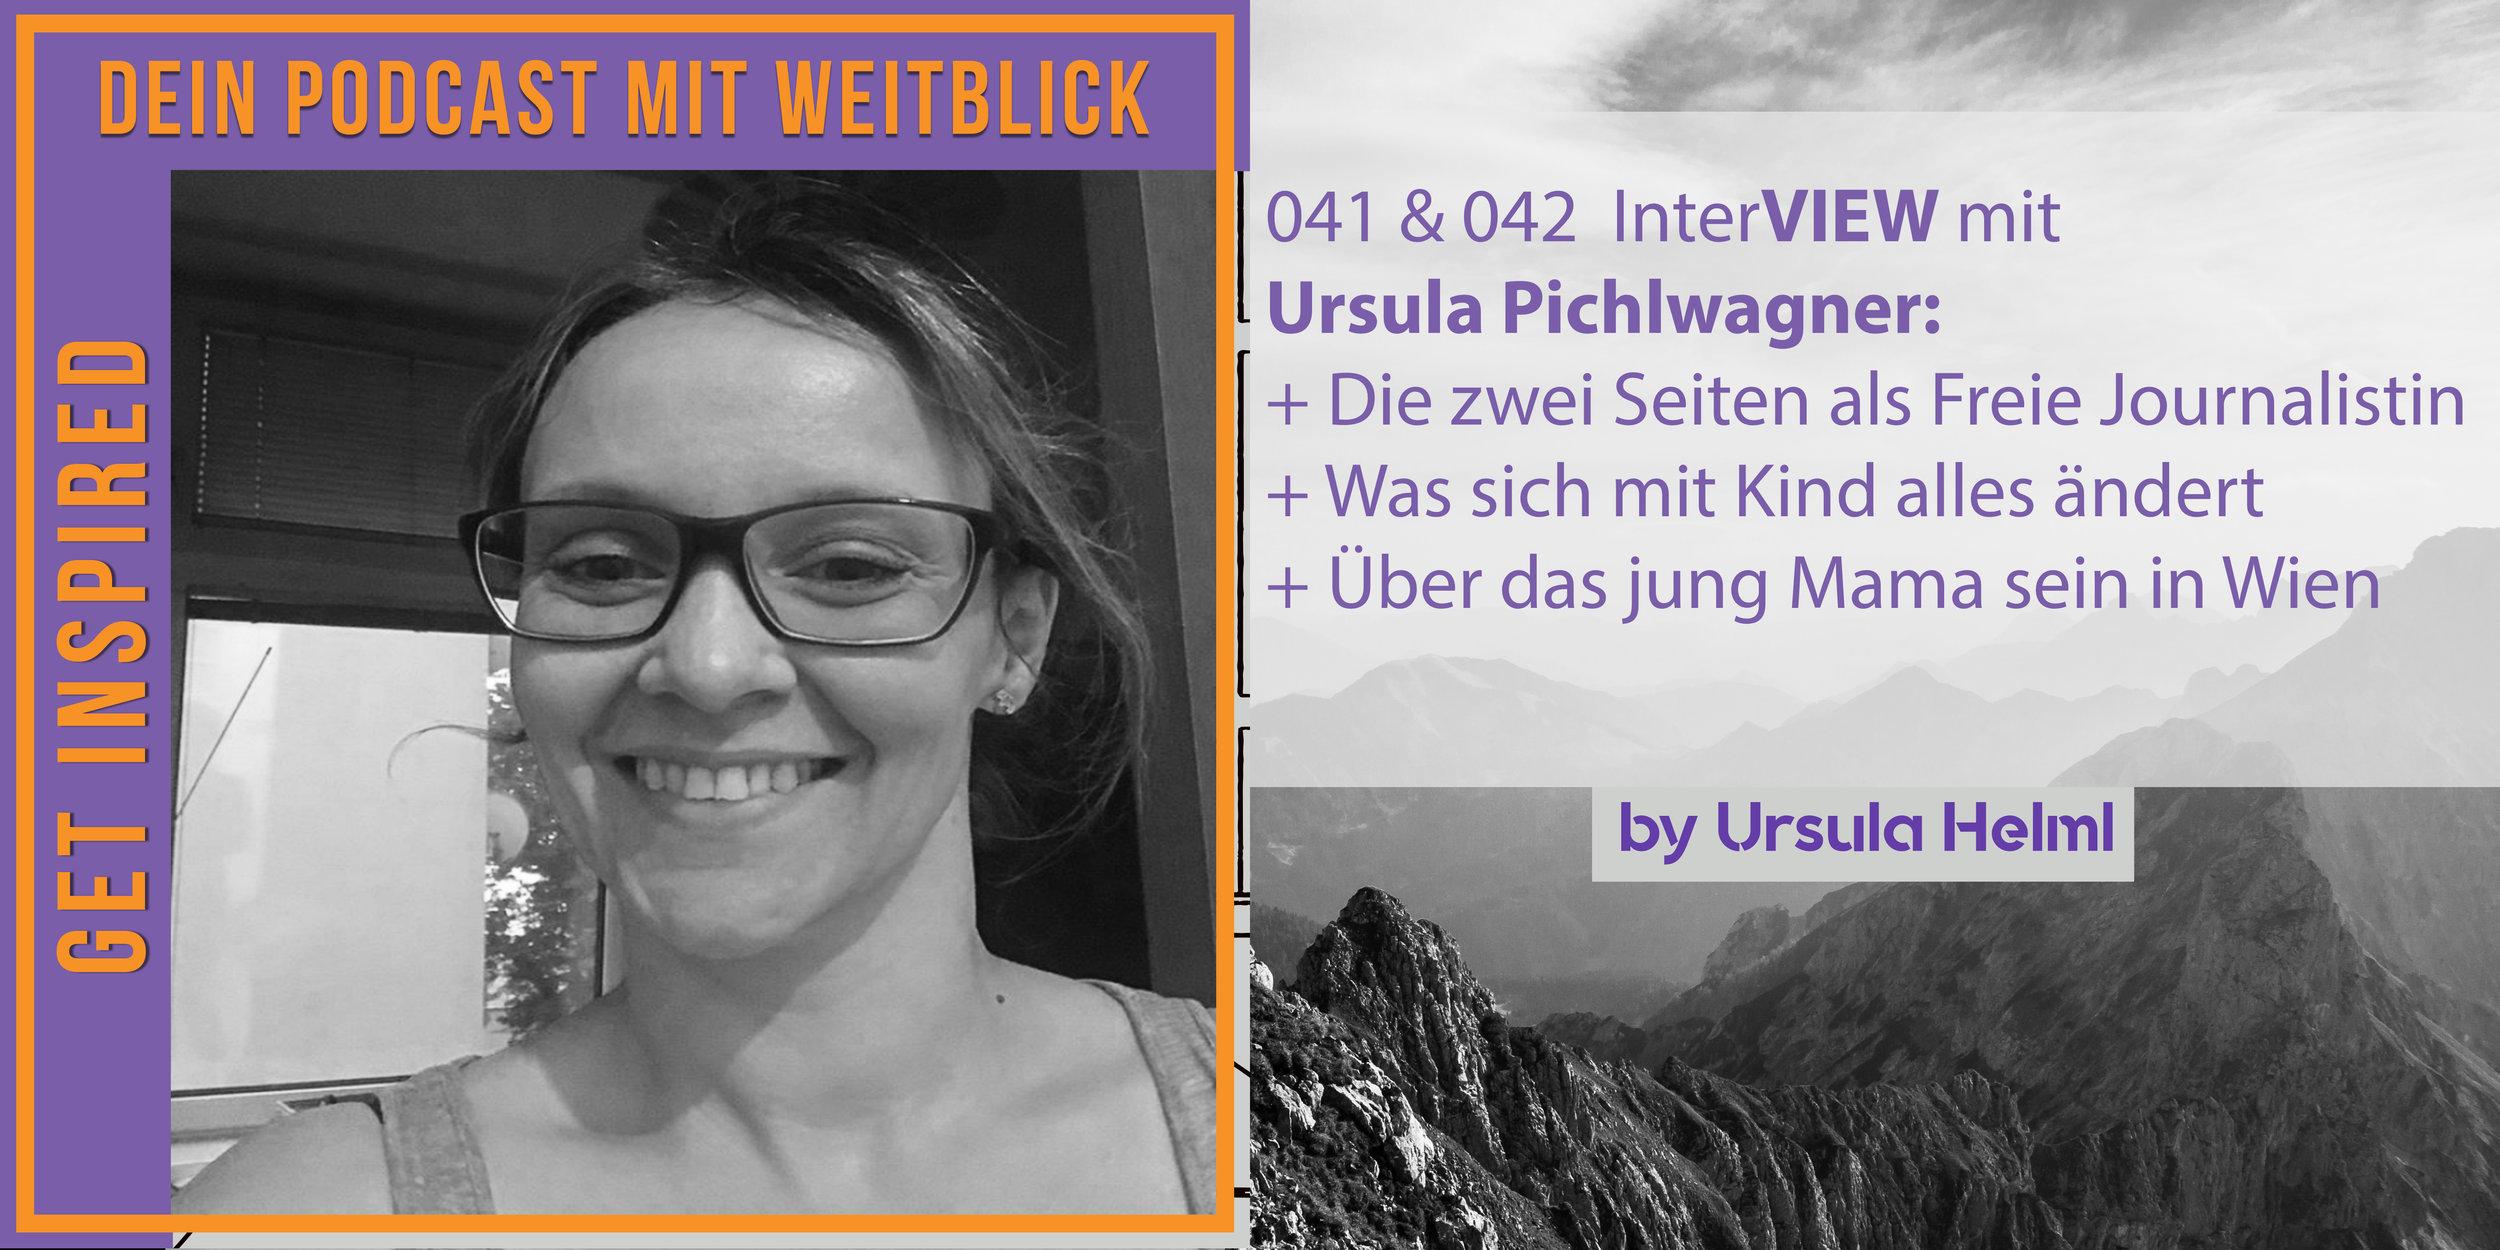 UrsulaPichlwagner.jpg